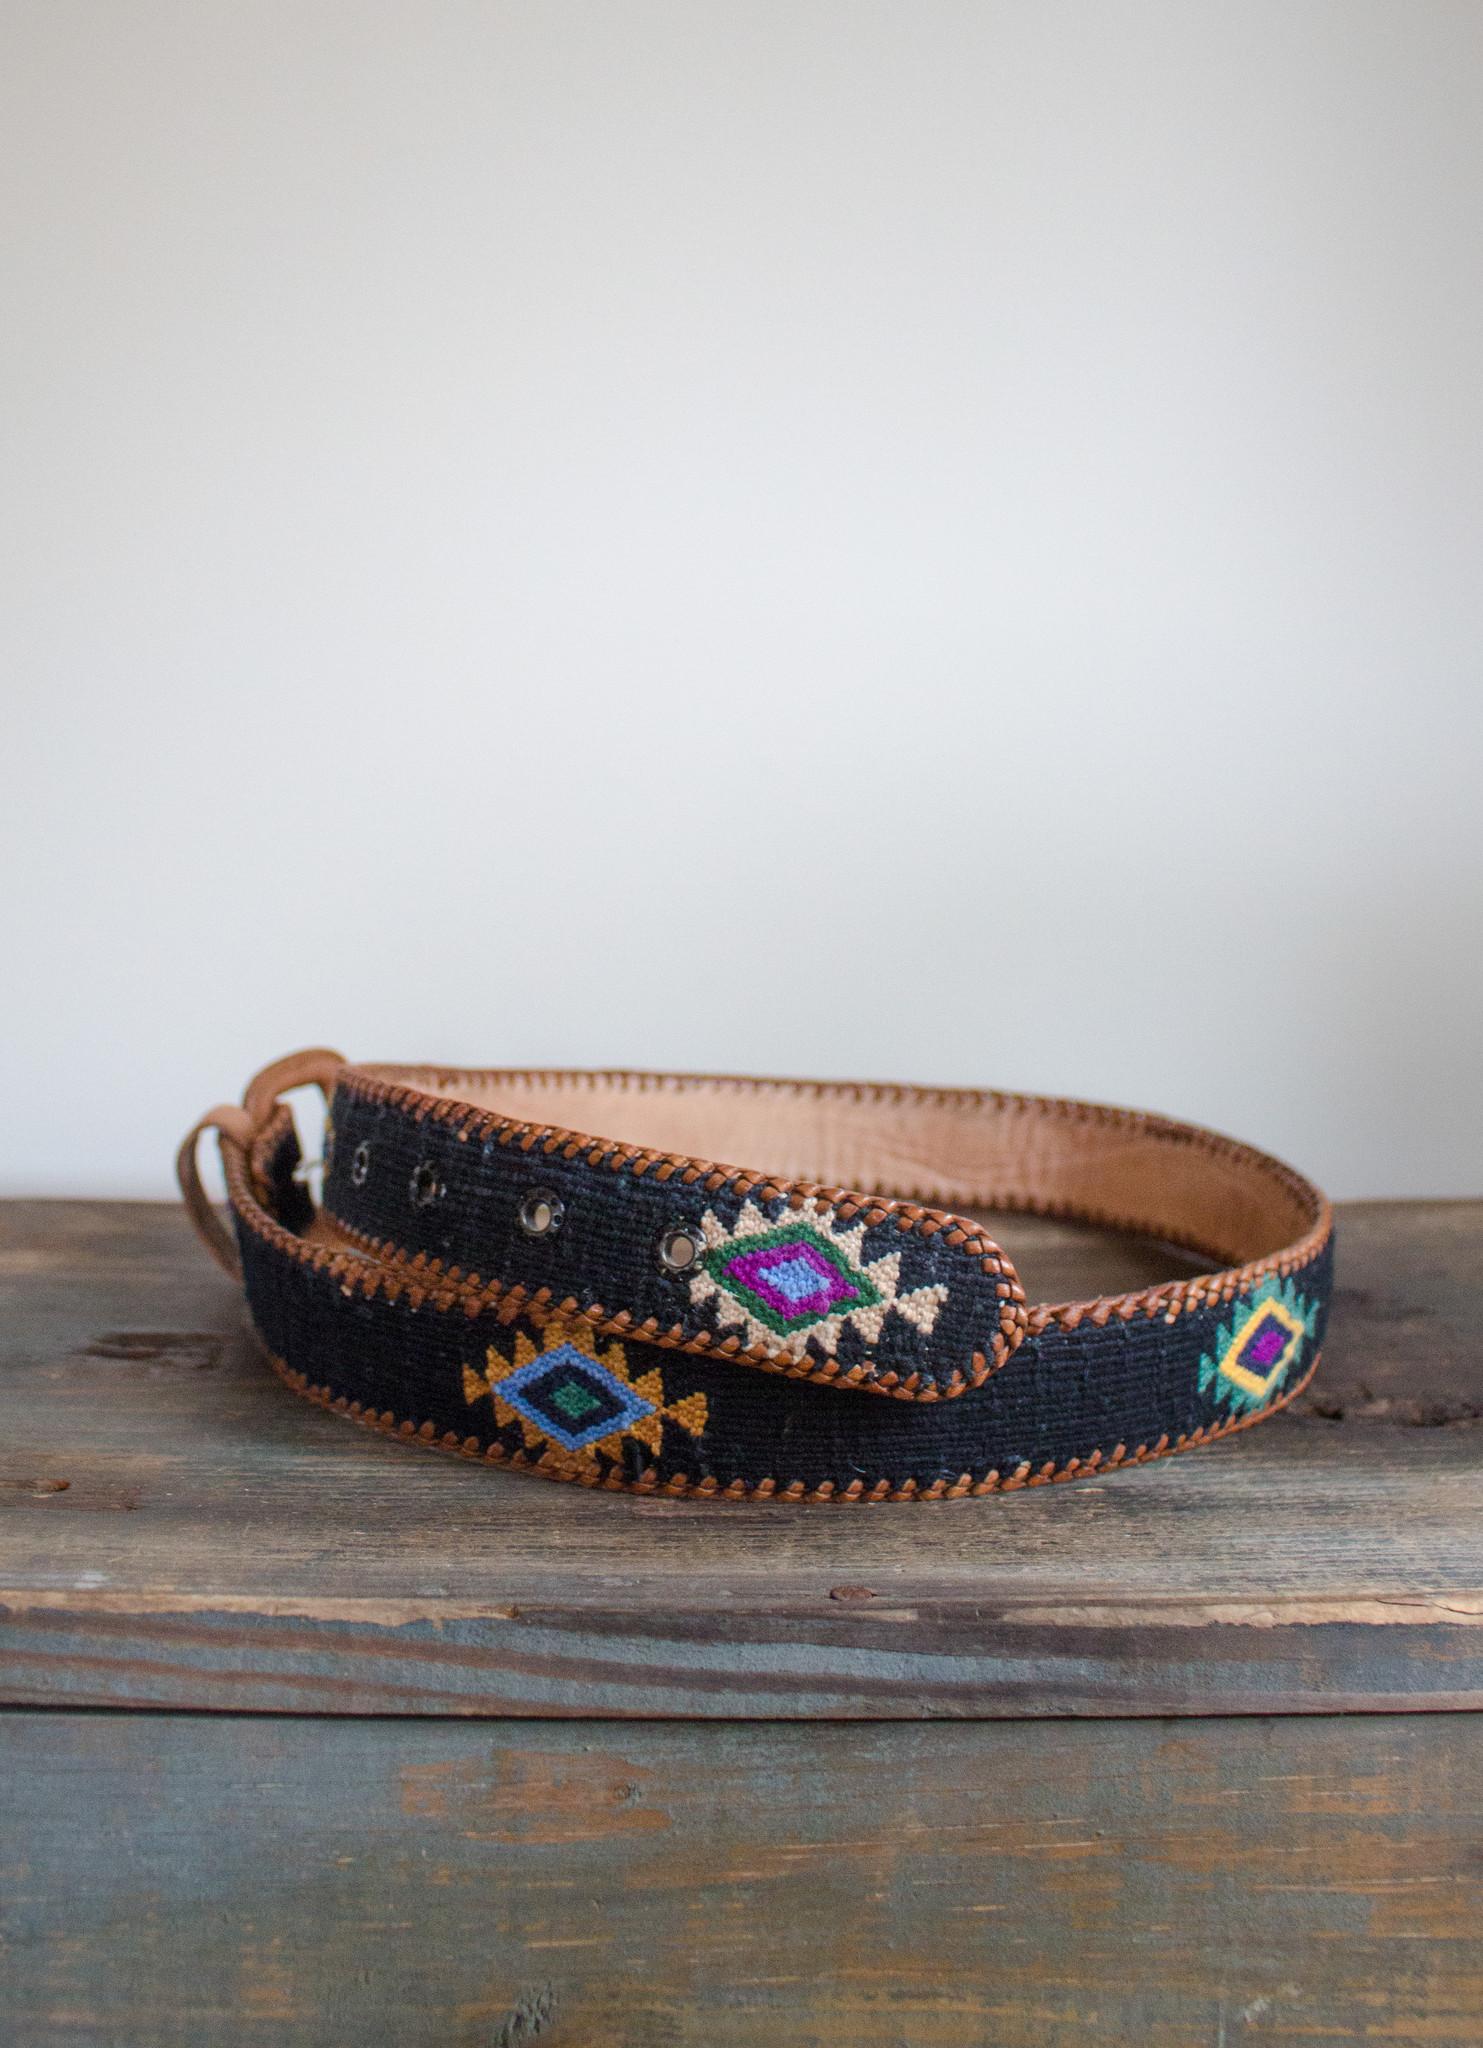 The Birch Store Woven Navajo Design Belt